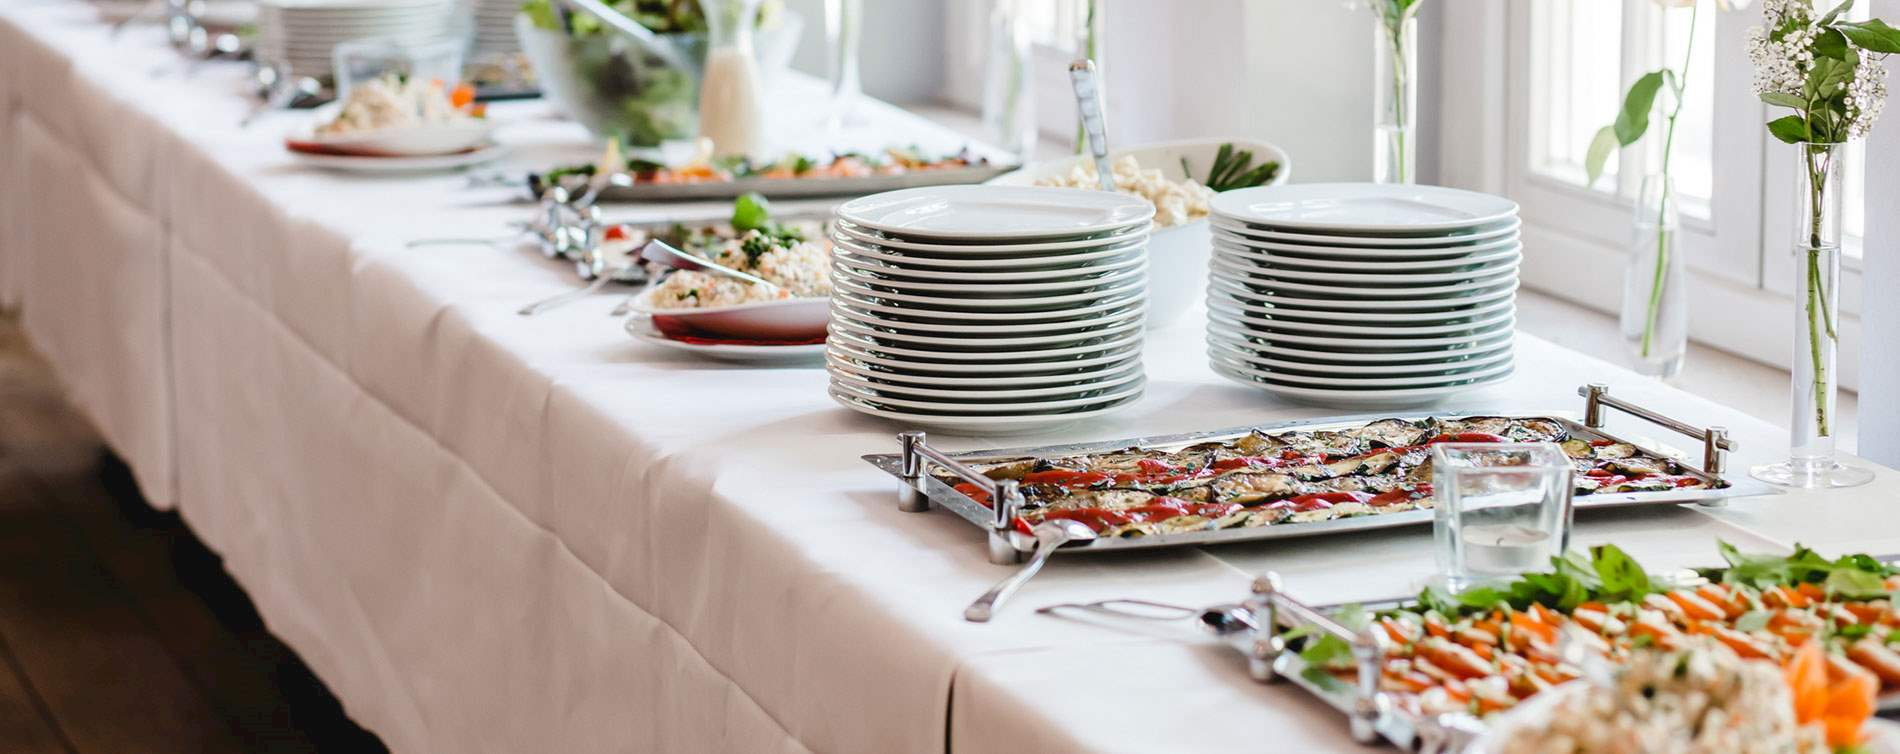 Catering at BEST WESTERN Sonoma Valley Inn & Krug Event Center, California